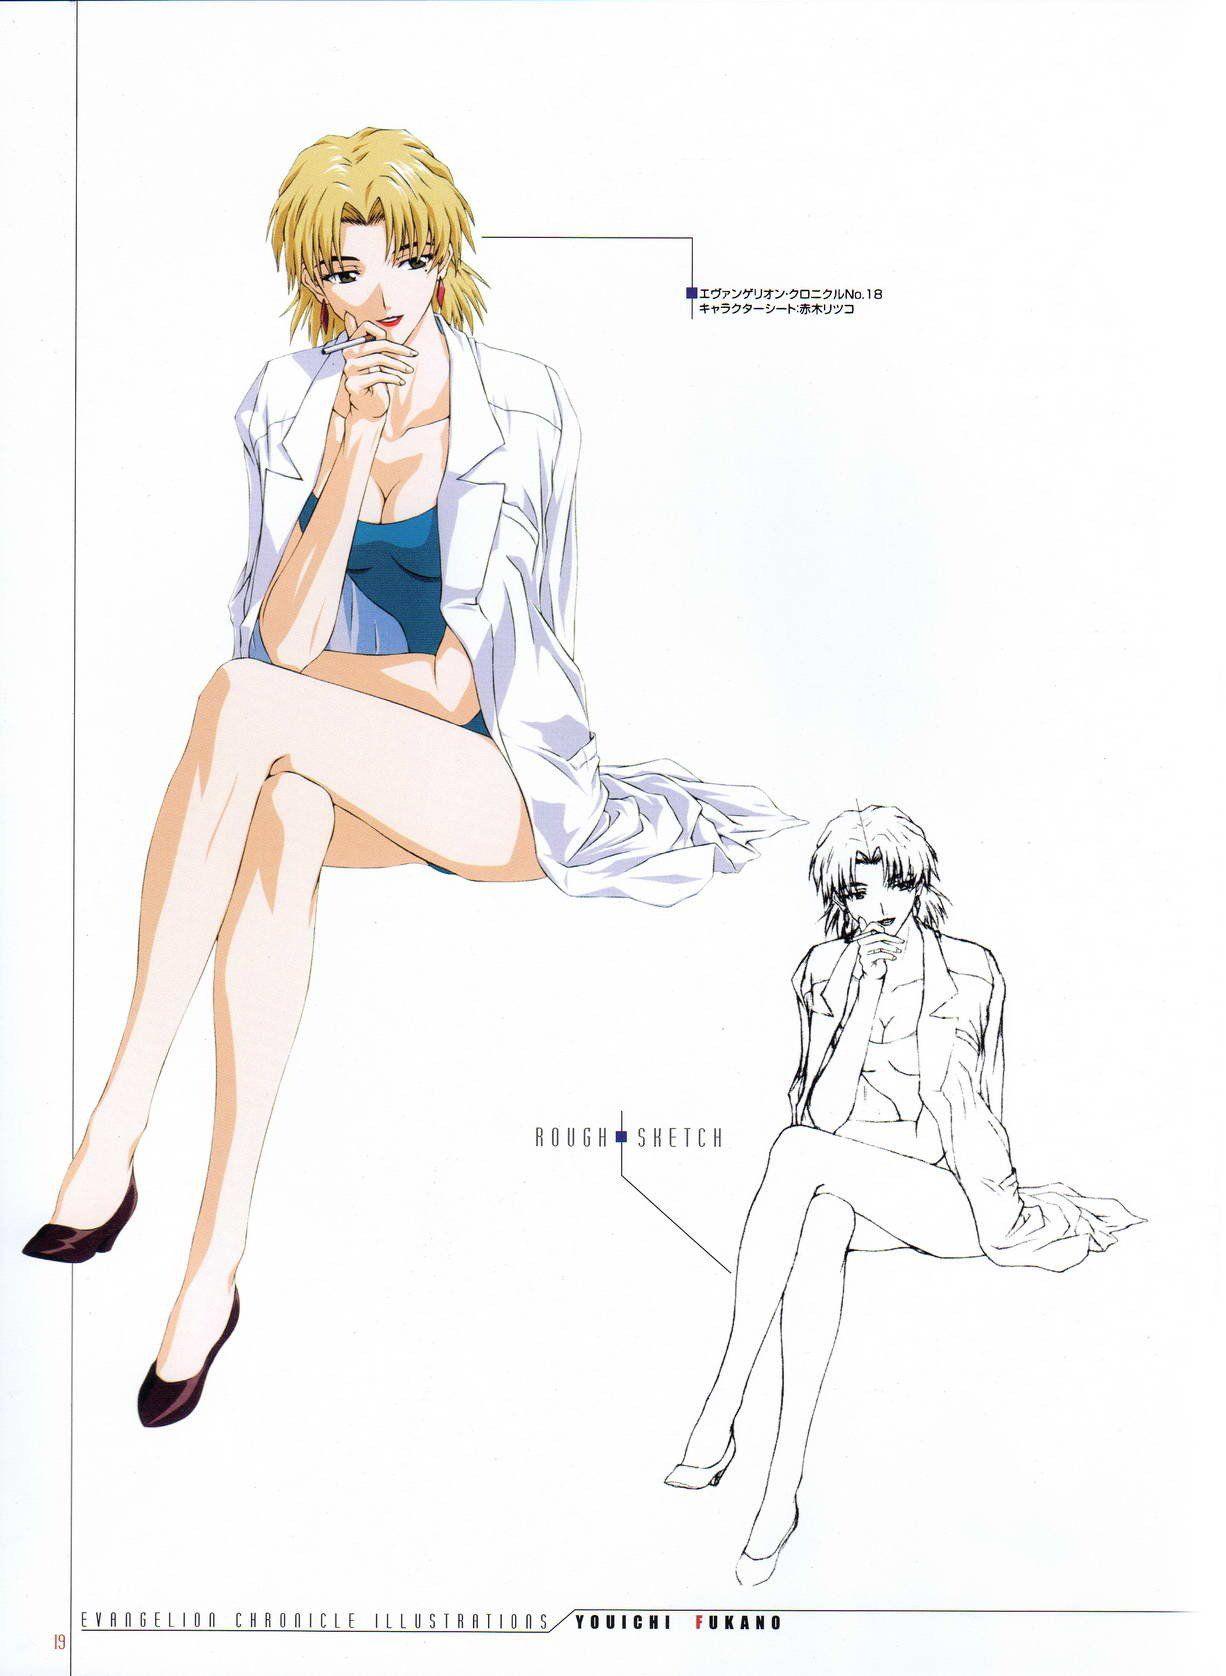 Evangelion - Chronicle Illustrations [artbook]- Ritsuko Akagui